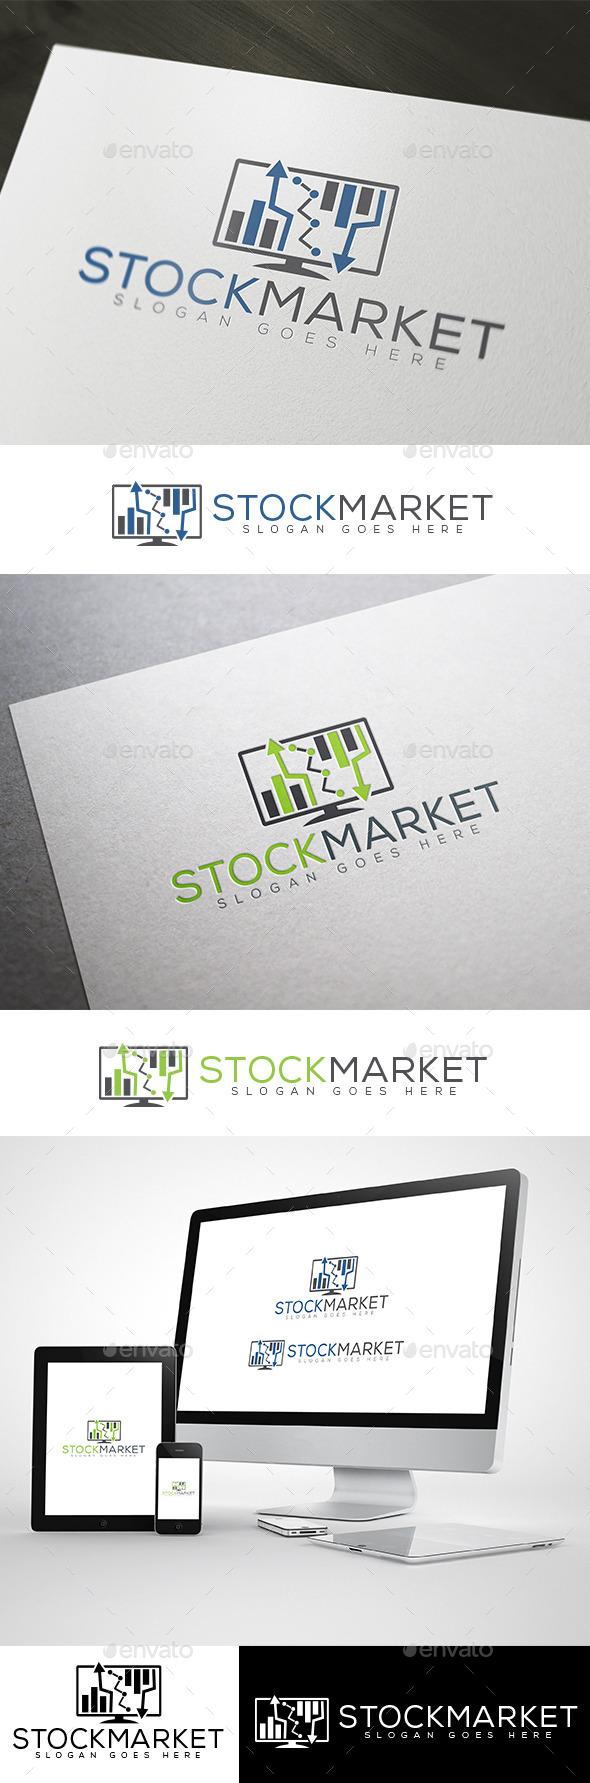 Stock Market & Online Finance Logo